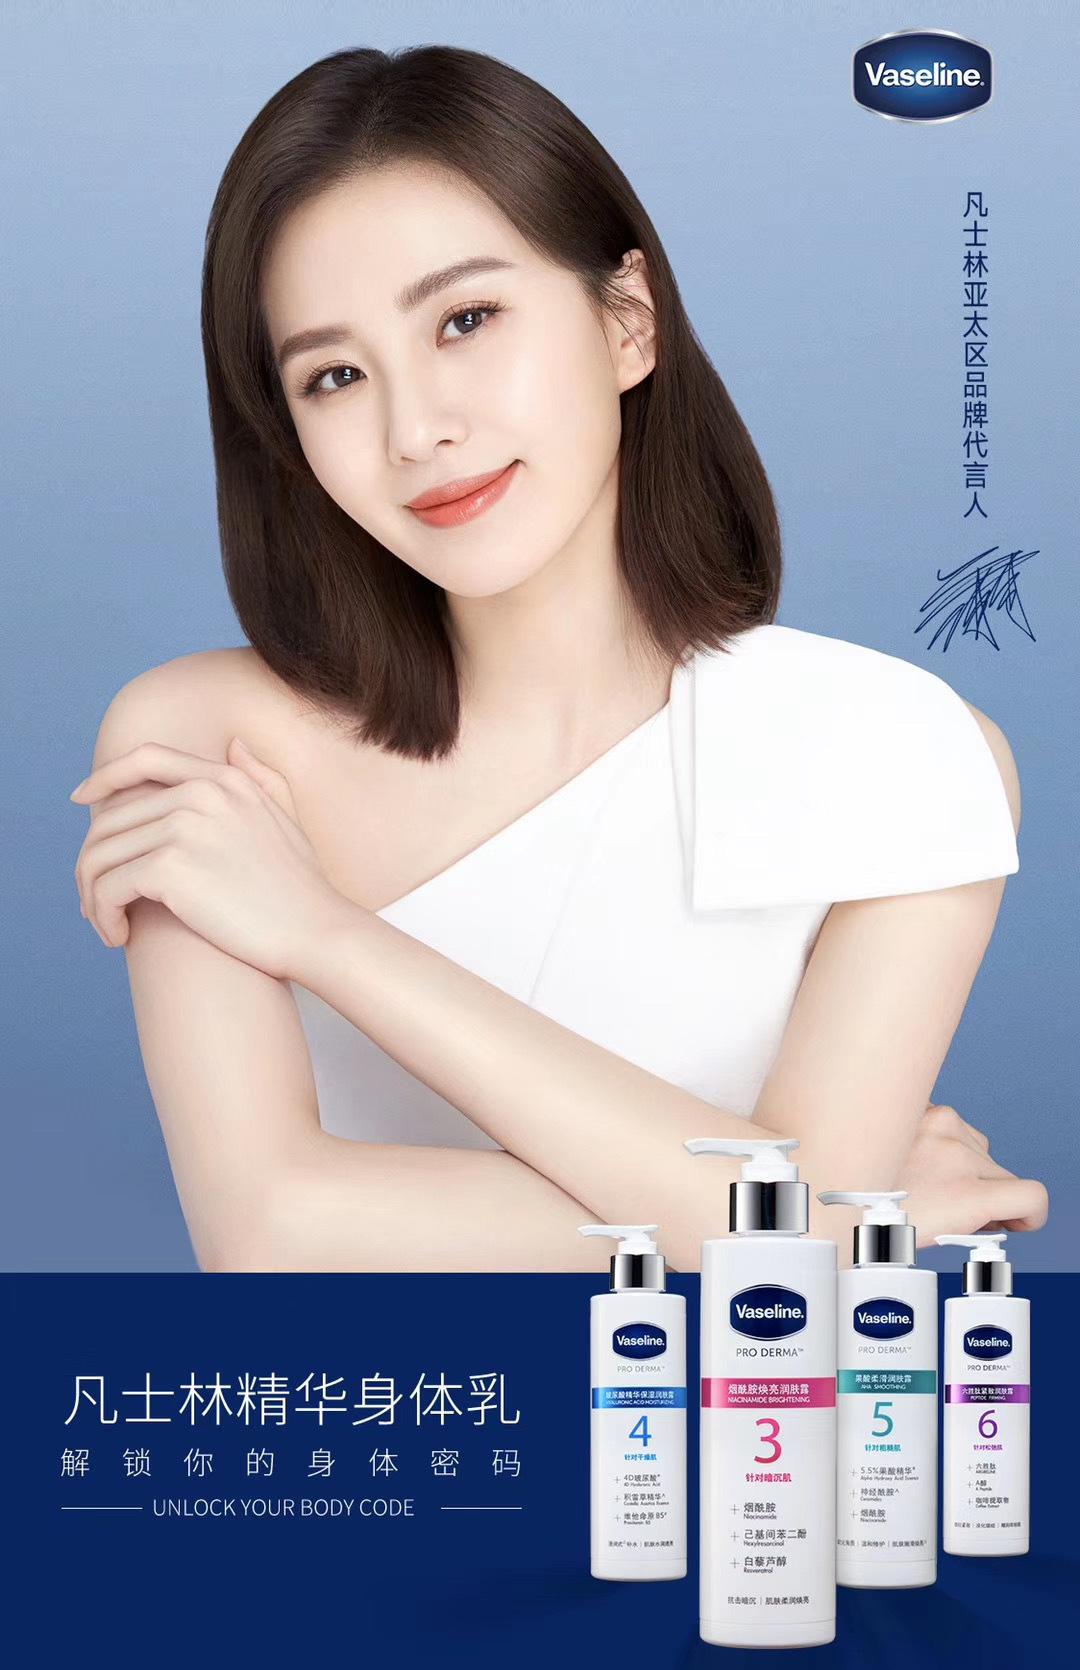 Advertising campaign   刘诗诗✖️凡士林来自亚太区代言人刘诗诗的